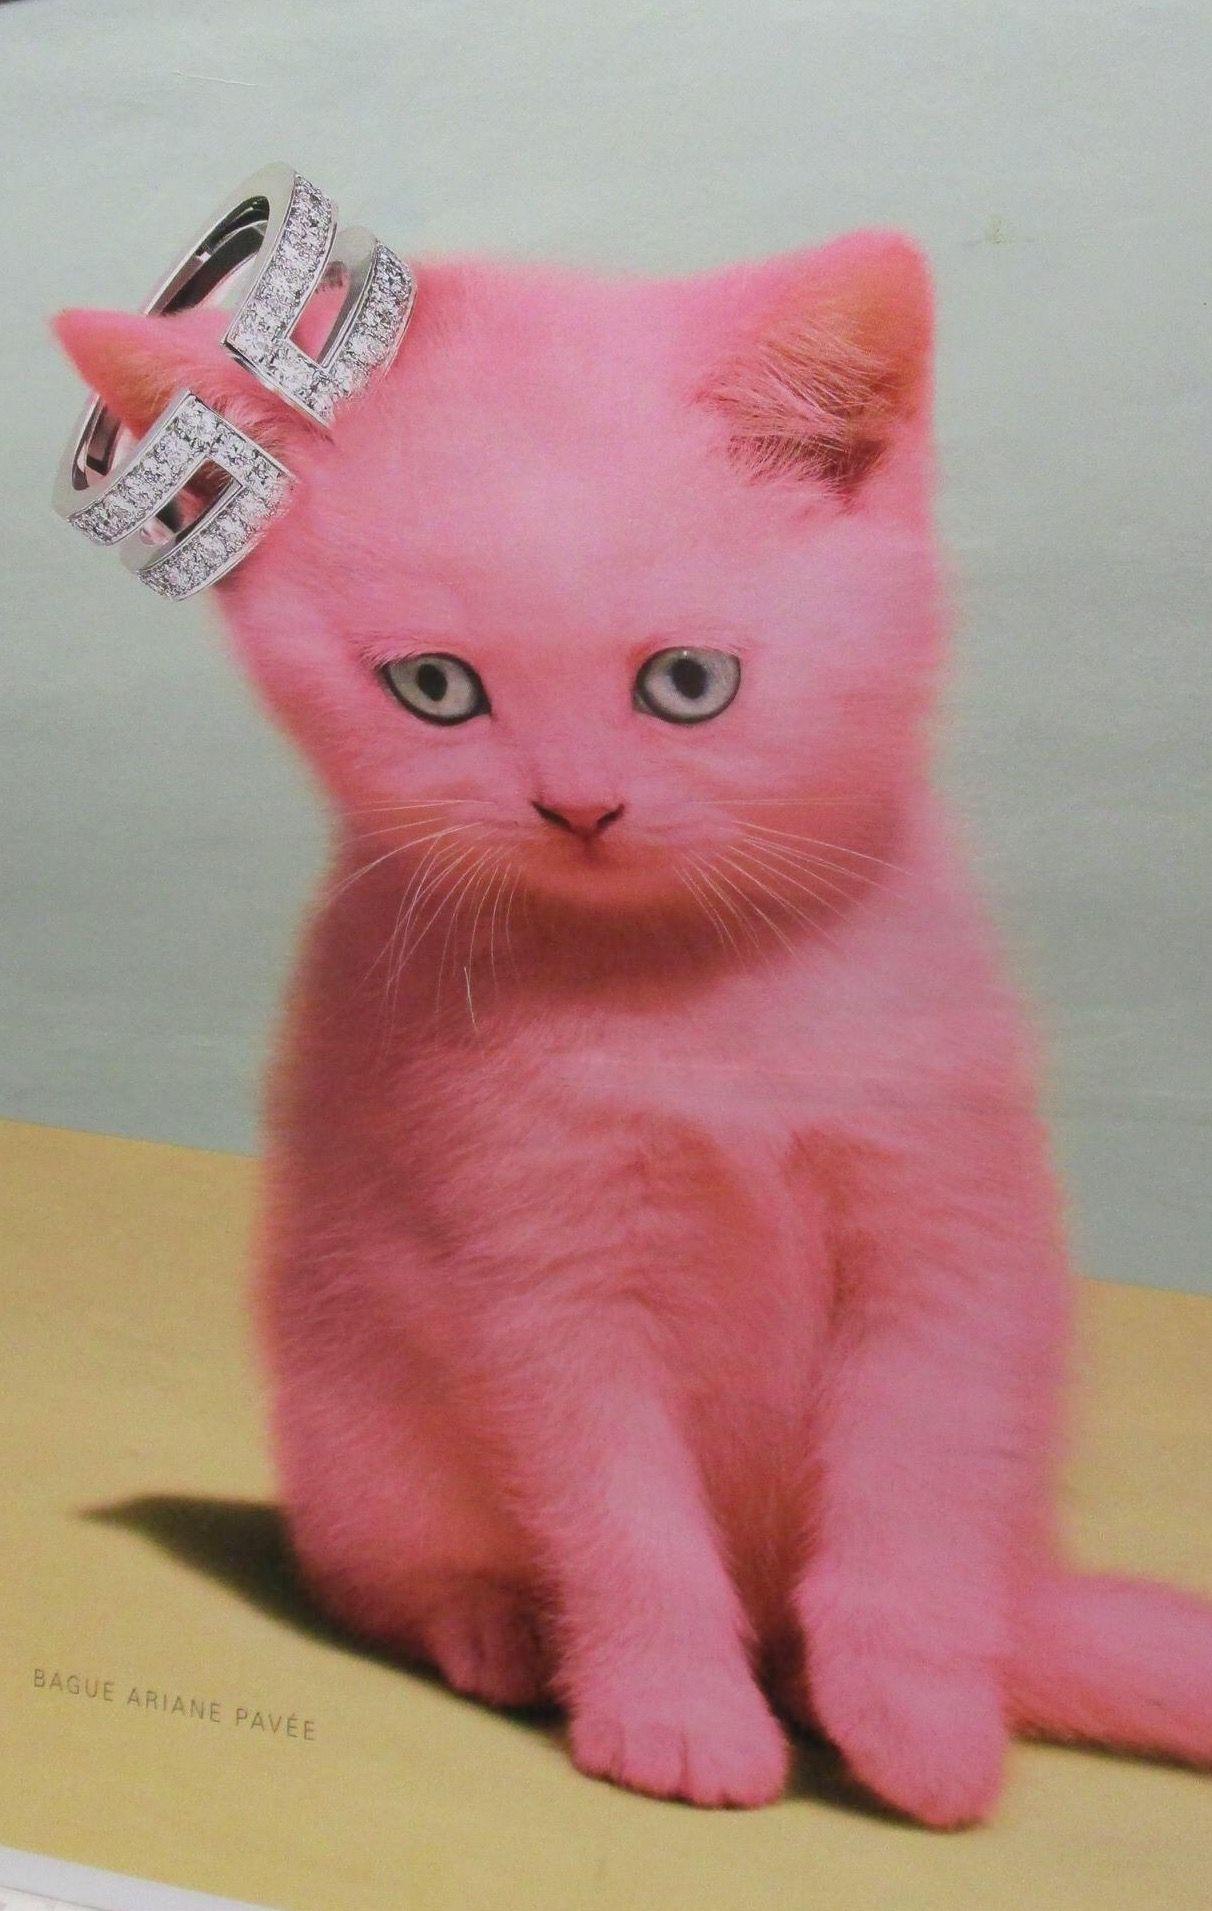 Pink Kitten Paris Subway Advert Poster Photo Credit Pamela Bliss Kitten Feline Pets